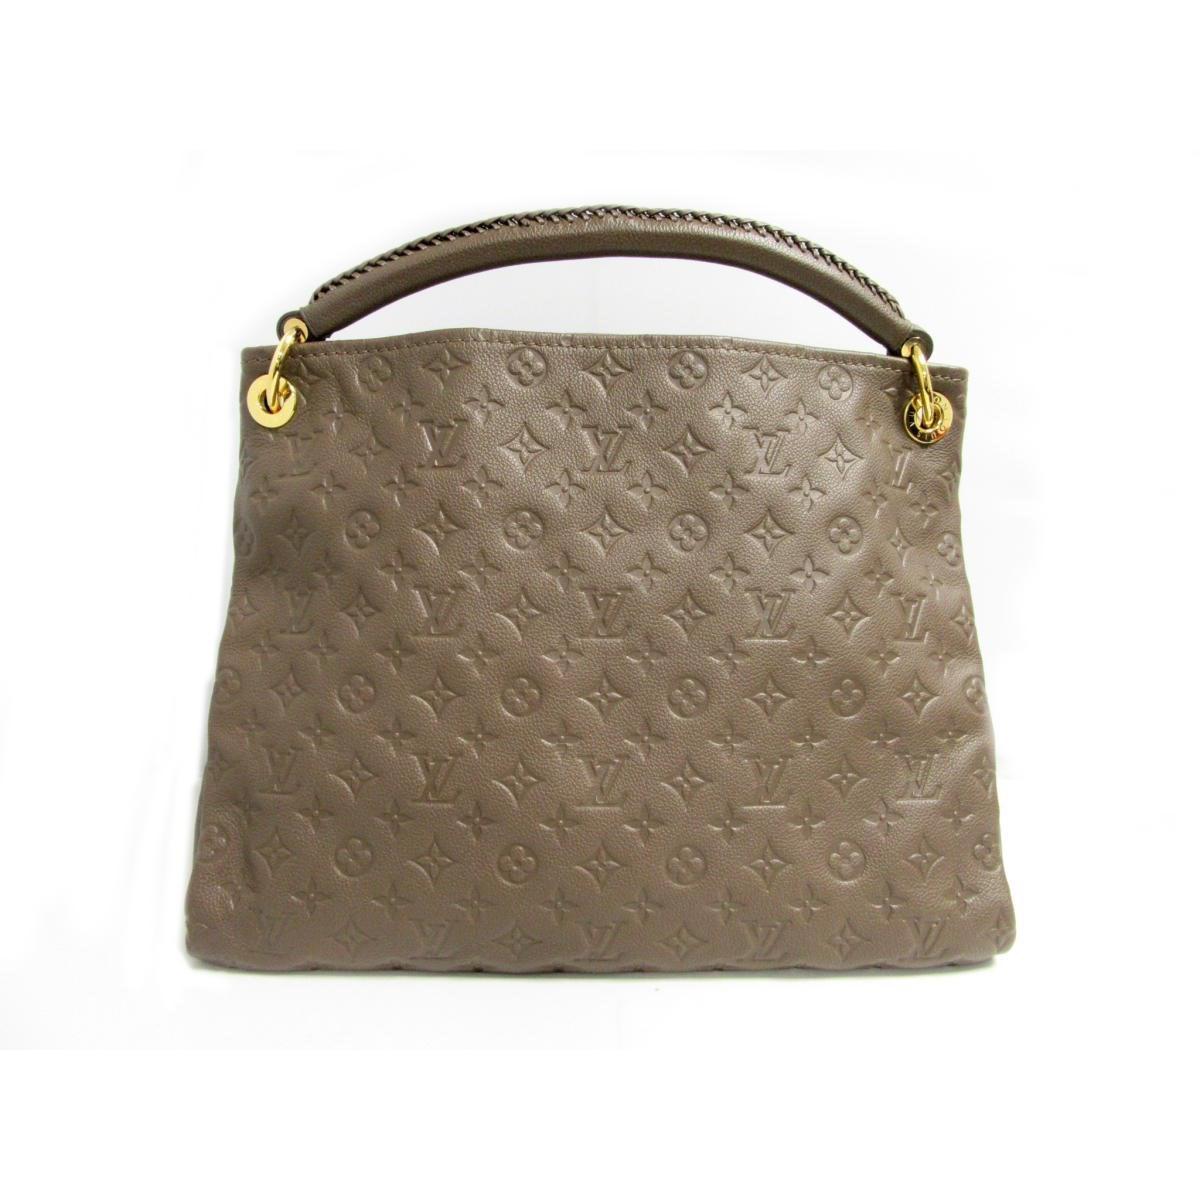 7b0b7860a0b1 Lyst - Louis Vuitton Artsy Mm Shoulder Bag M94171 Monogram Empreinte ...